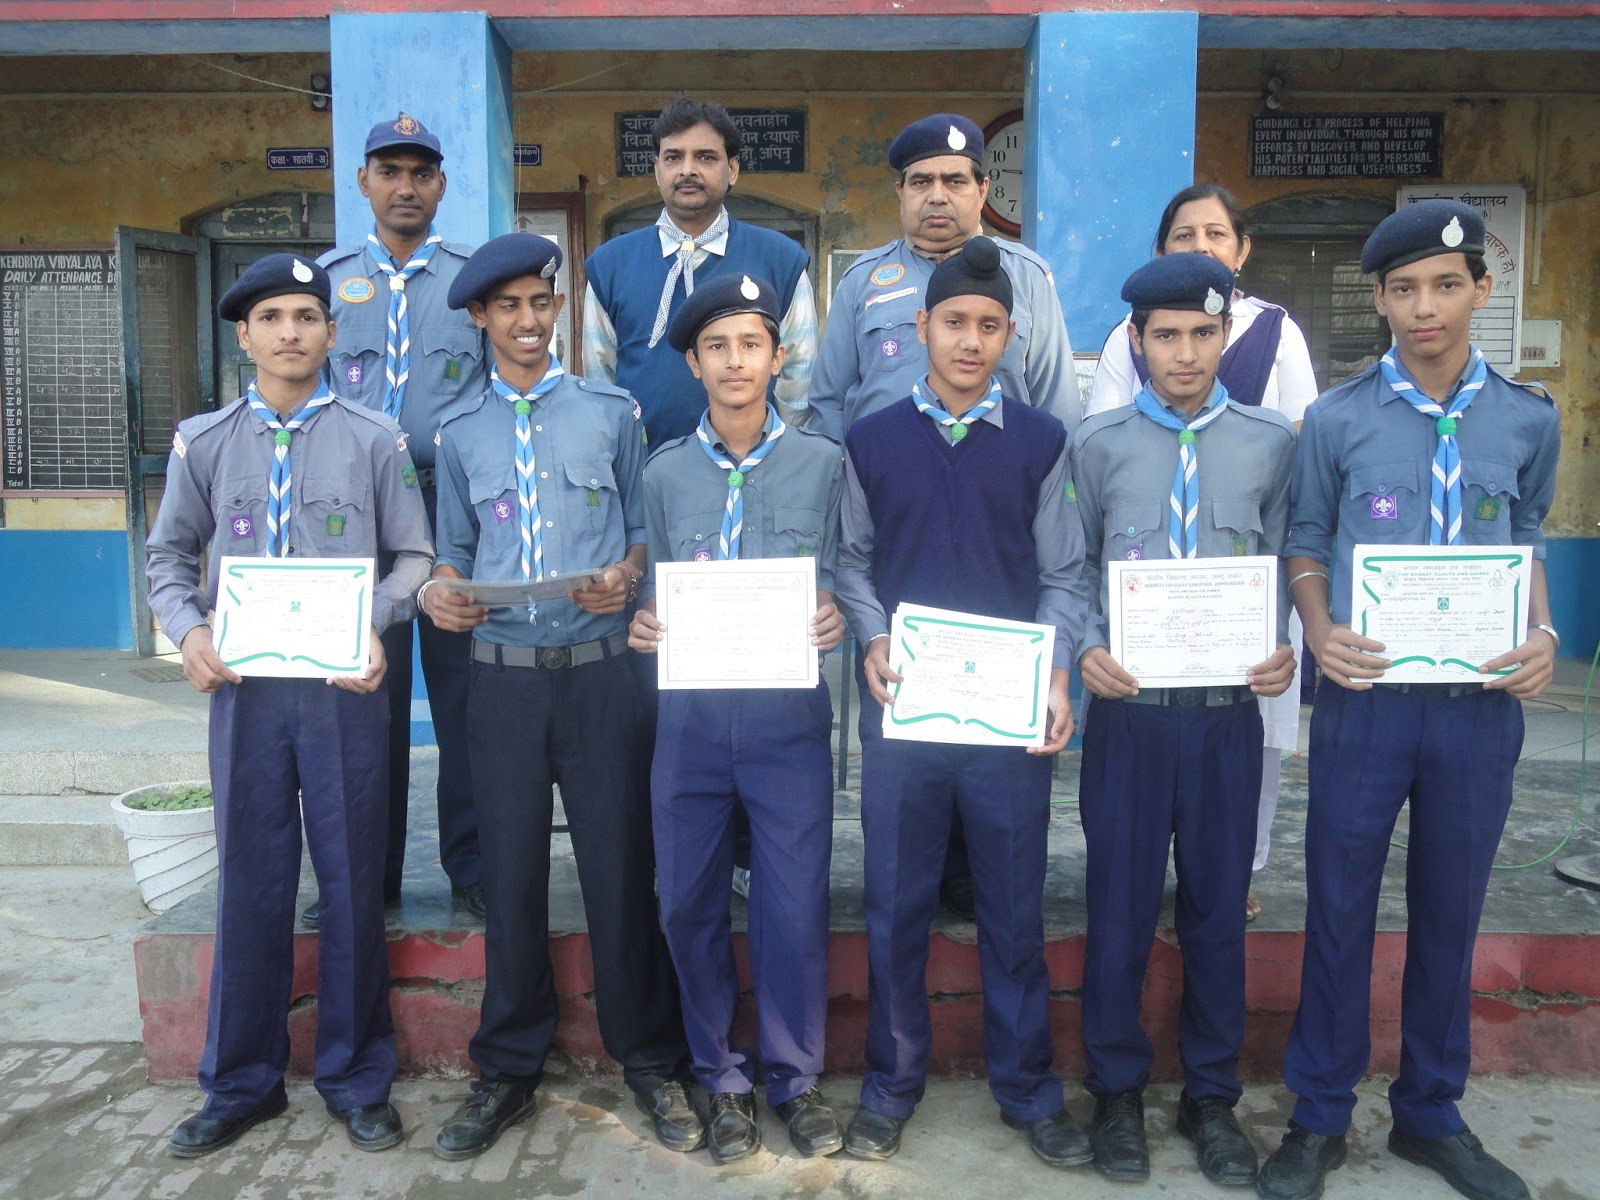 kendriya vidyalaya sangathan bharat scouts guides rajya puraskar rh kvsbsg blogspot com Guide and Scout Badges Logo Scouts And Guides